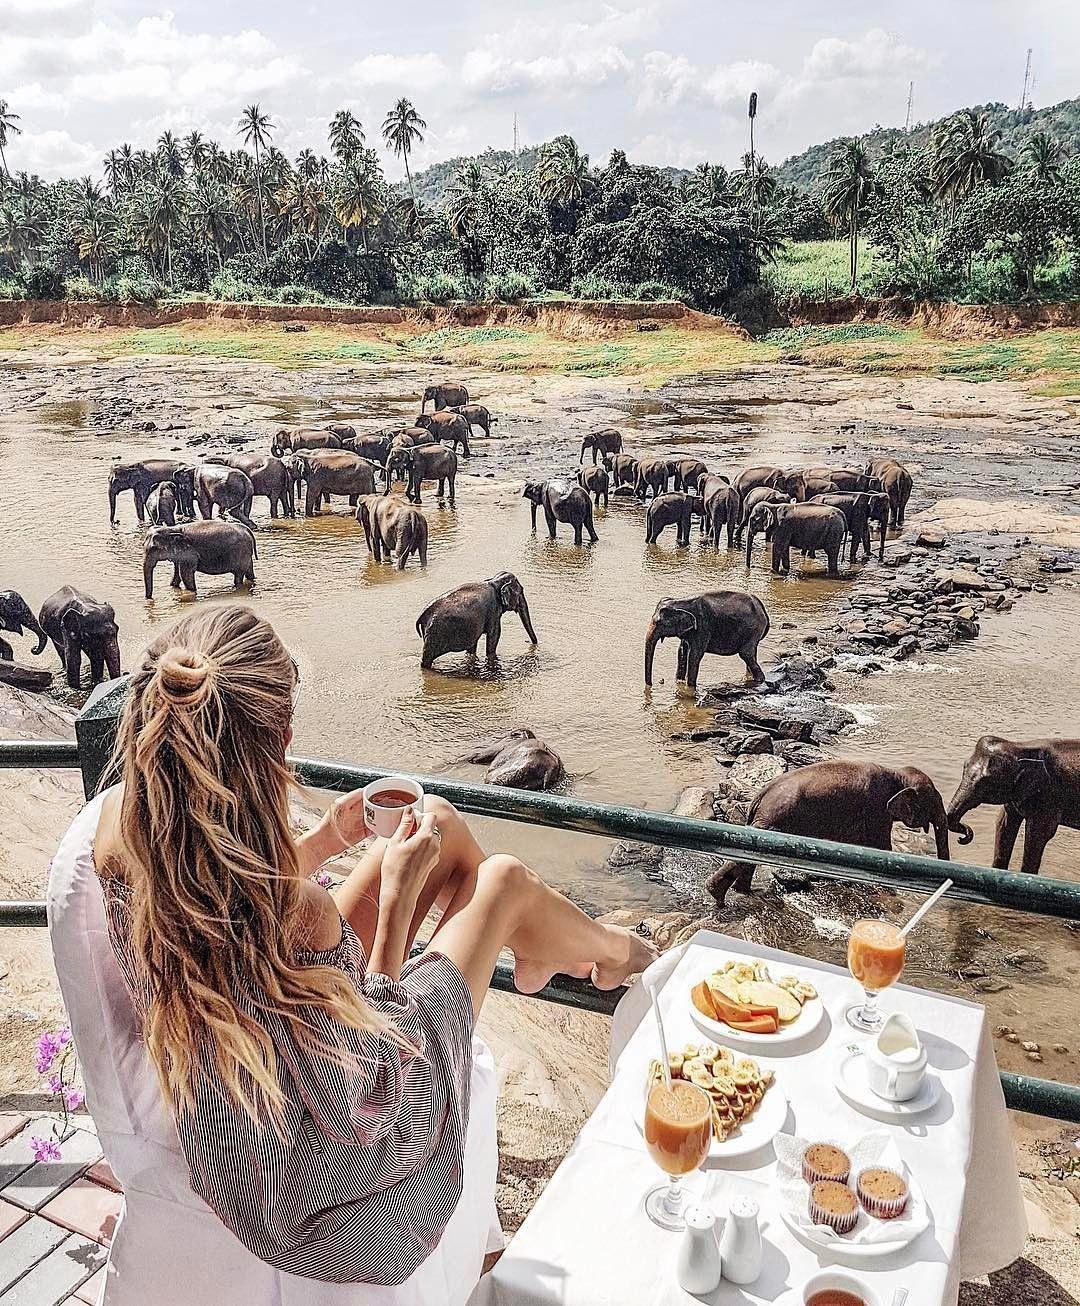 "14.7k Likes, 444 Comments - Bucket Listers (@bucketlisters) on Instagram: ""Is Sri Lanka on your bucket list? 🐘✔️ 📸:@ohhcouture 🌎Pinnawala Elephant Orphanage"""